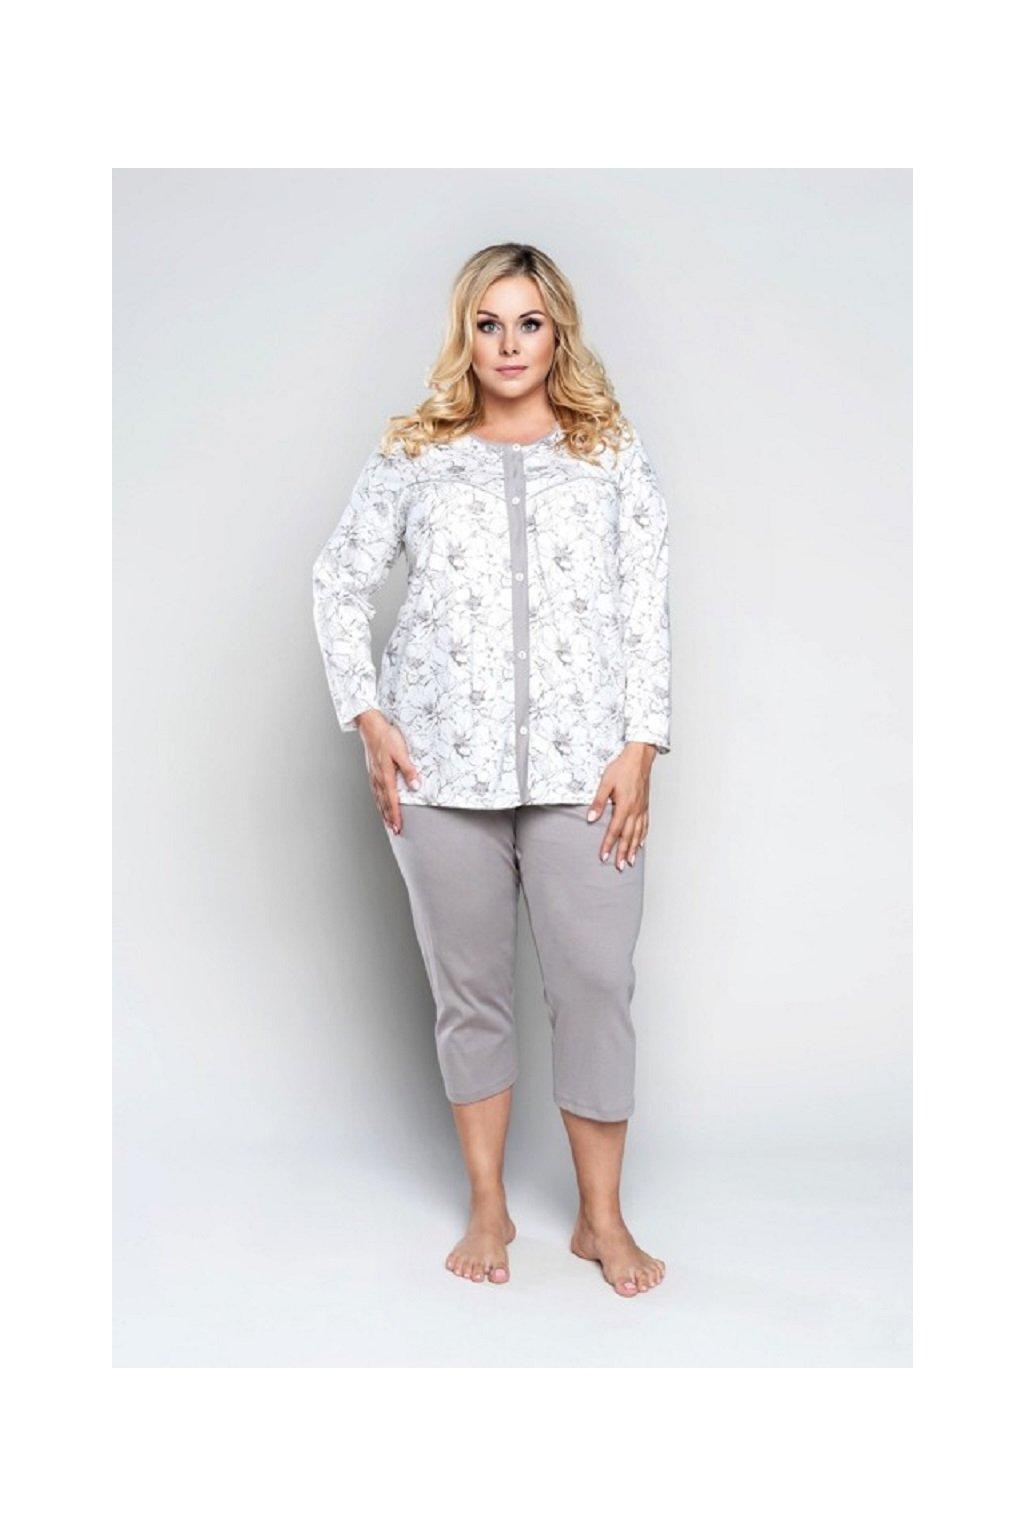 Dámské pyžamo Italian Fashion Krystyna 3/4 Bíla